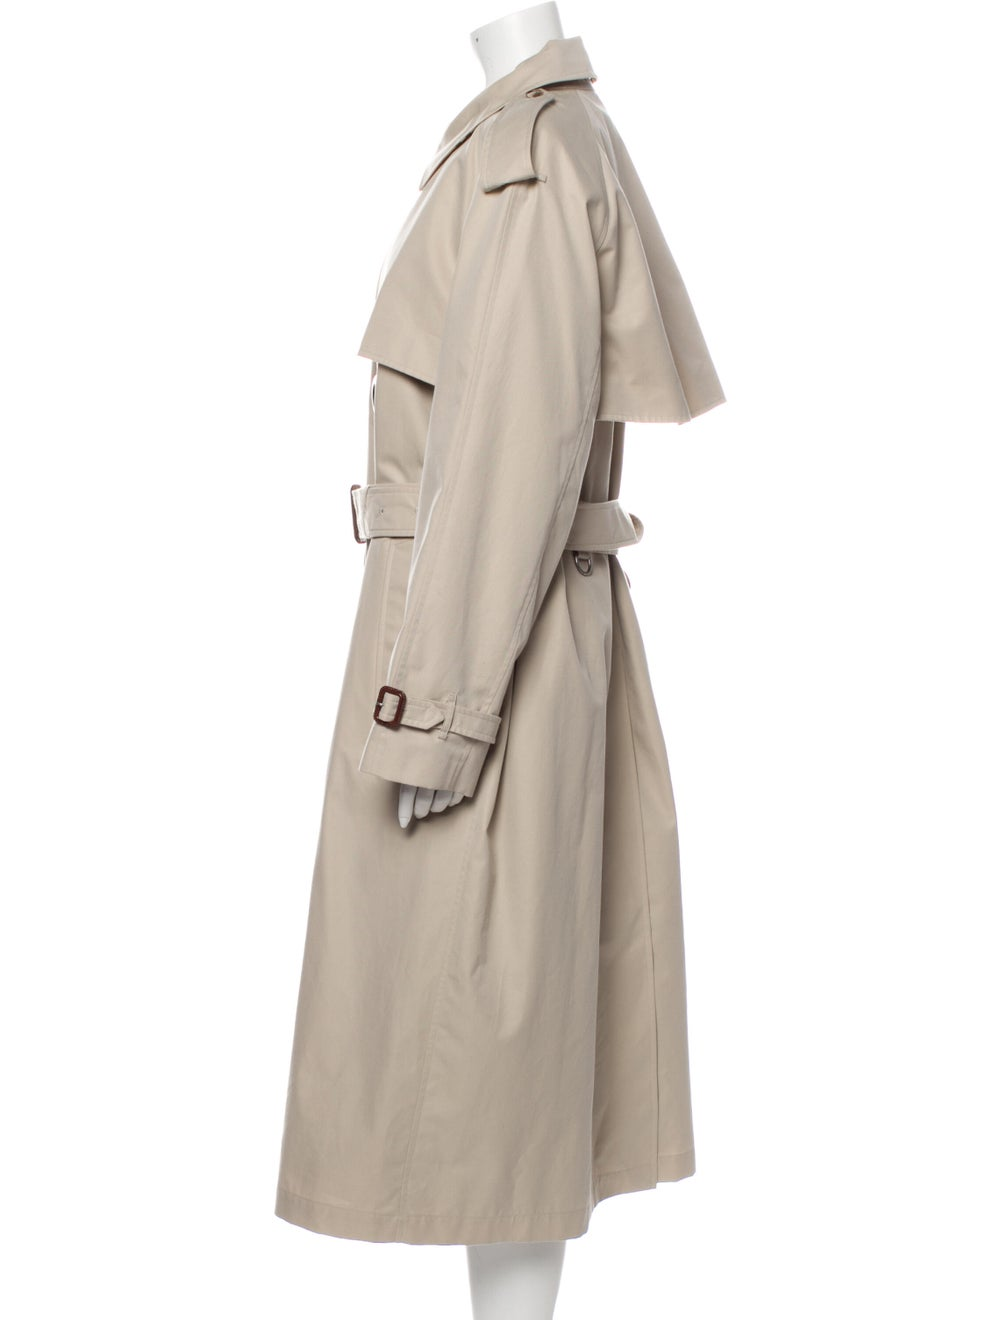 Burberry Trench Coat - image 2